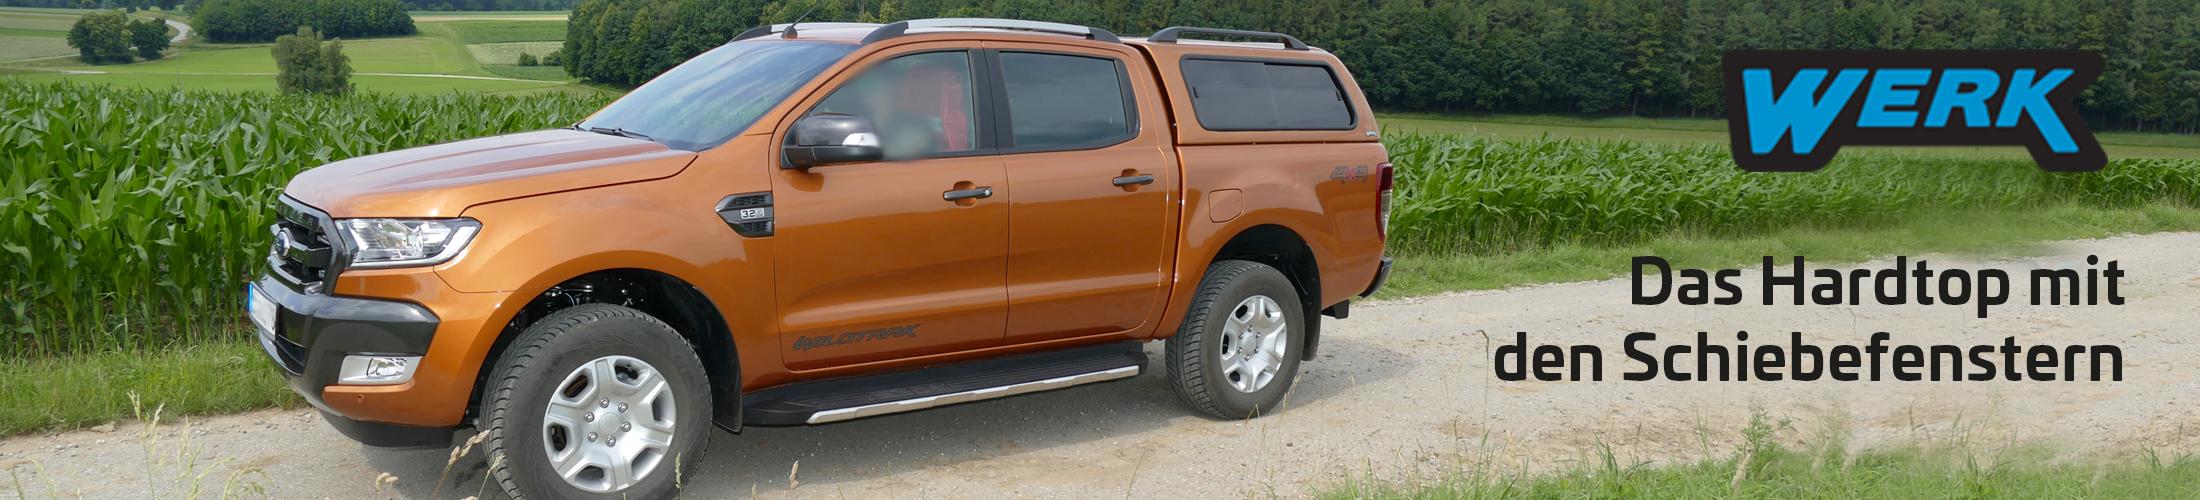 Werk Hardtop Ford Ranger